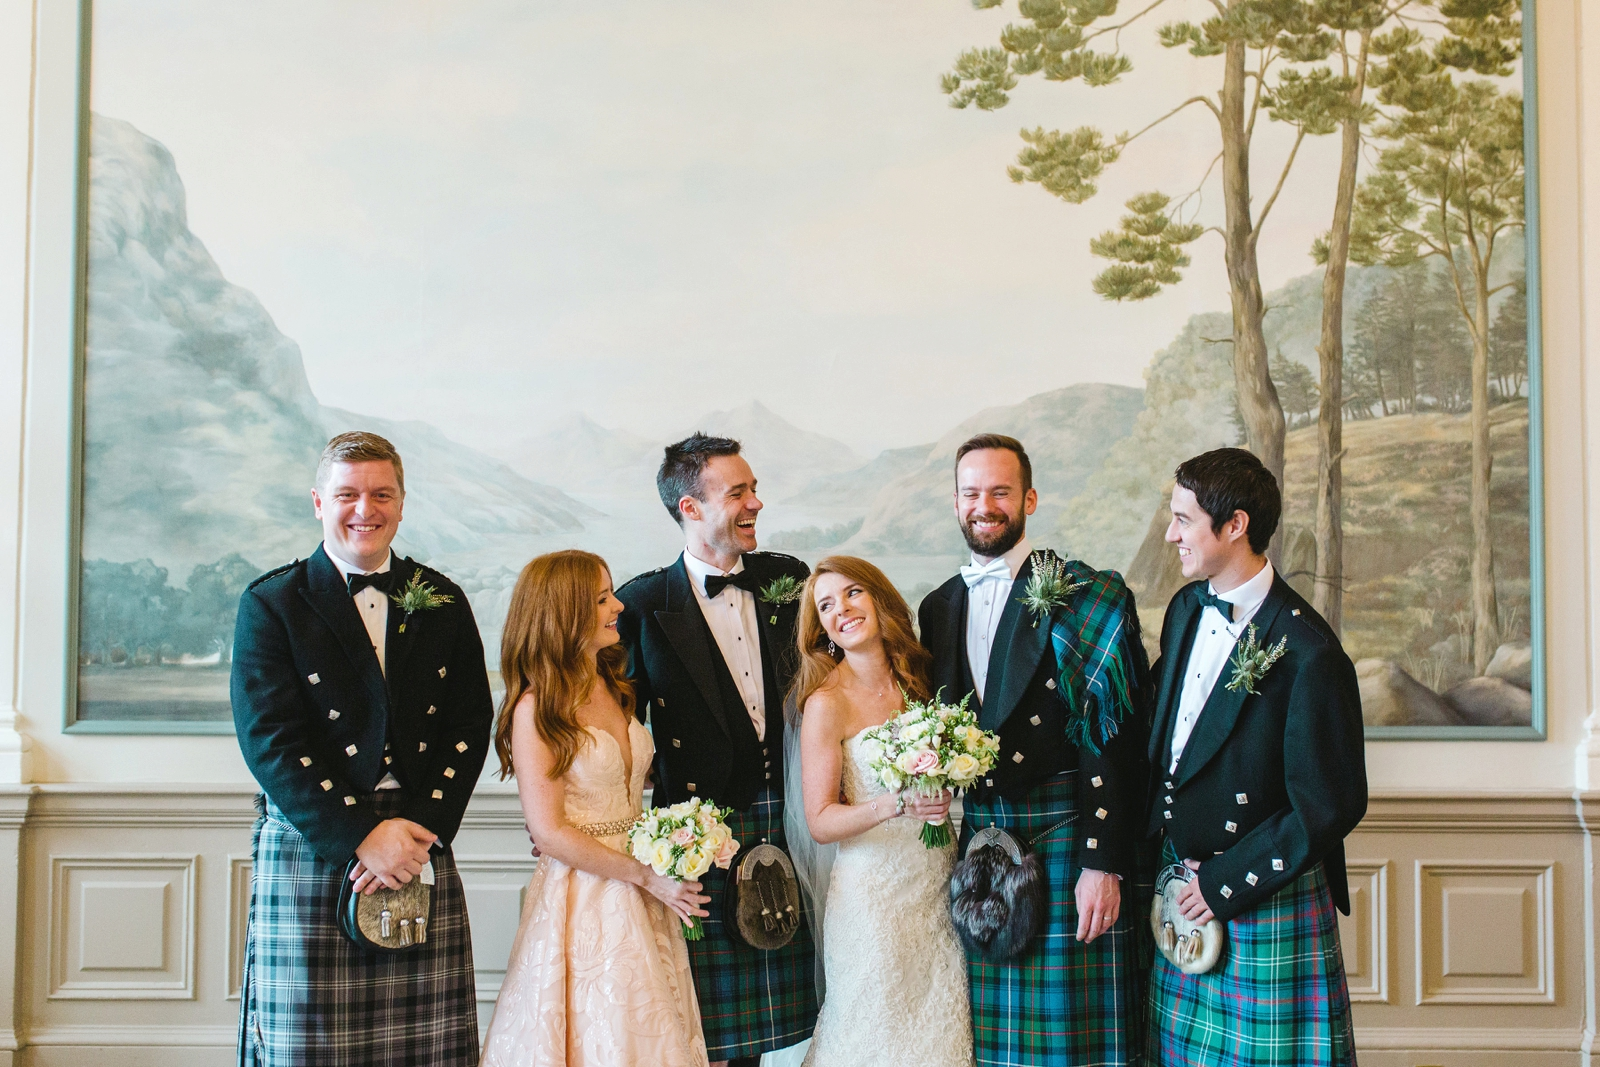 weddingthebalmoralsp4-6.jpg